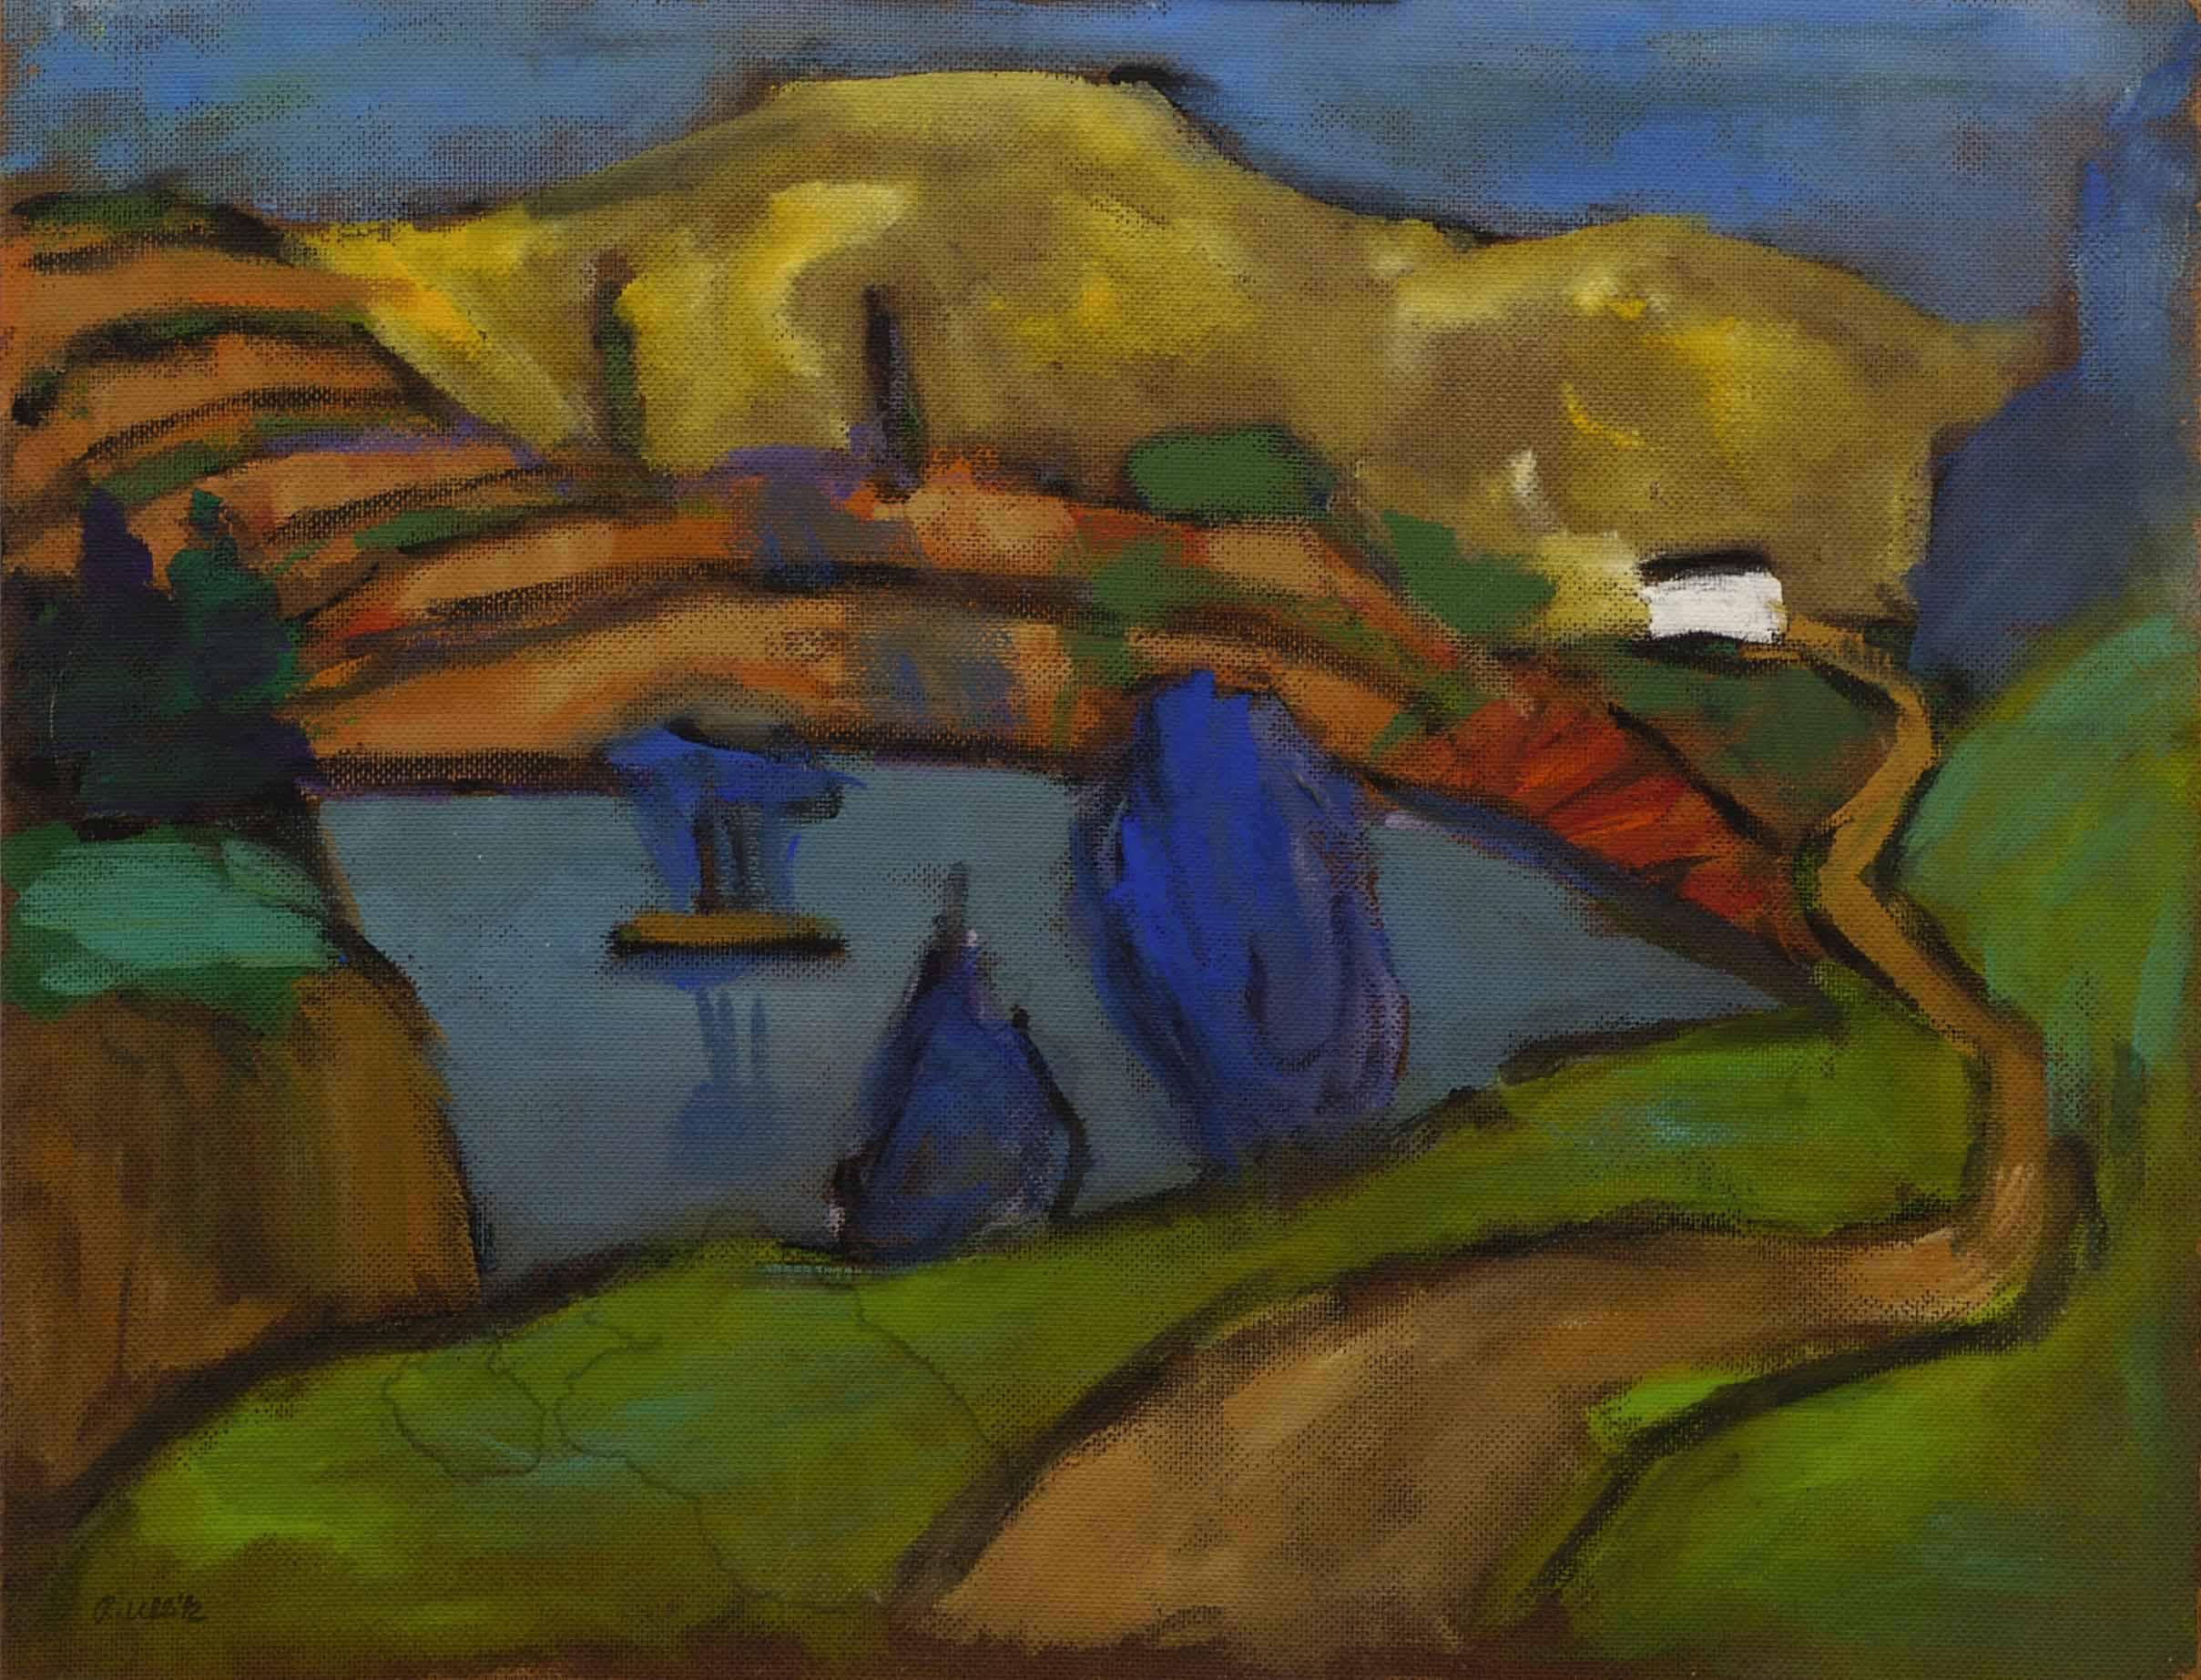 Maler Bergheim rudolf ullik maler wien künstlerhaus